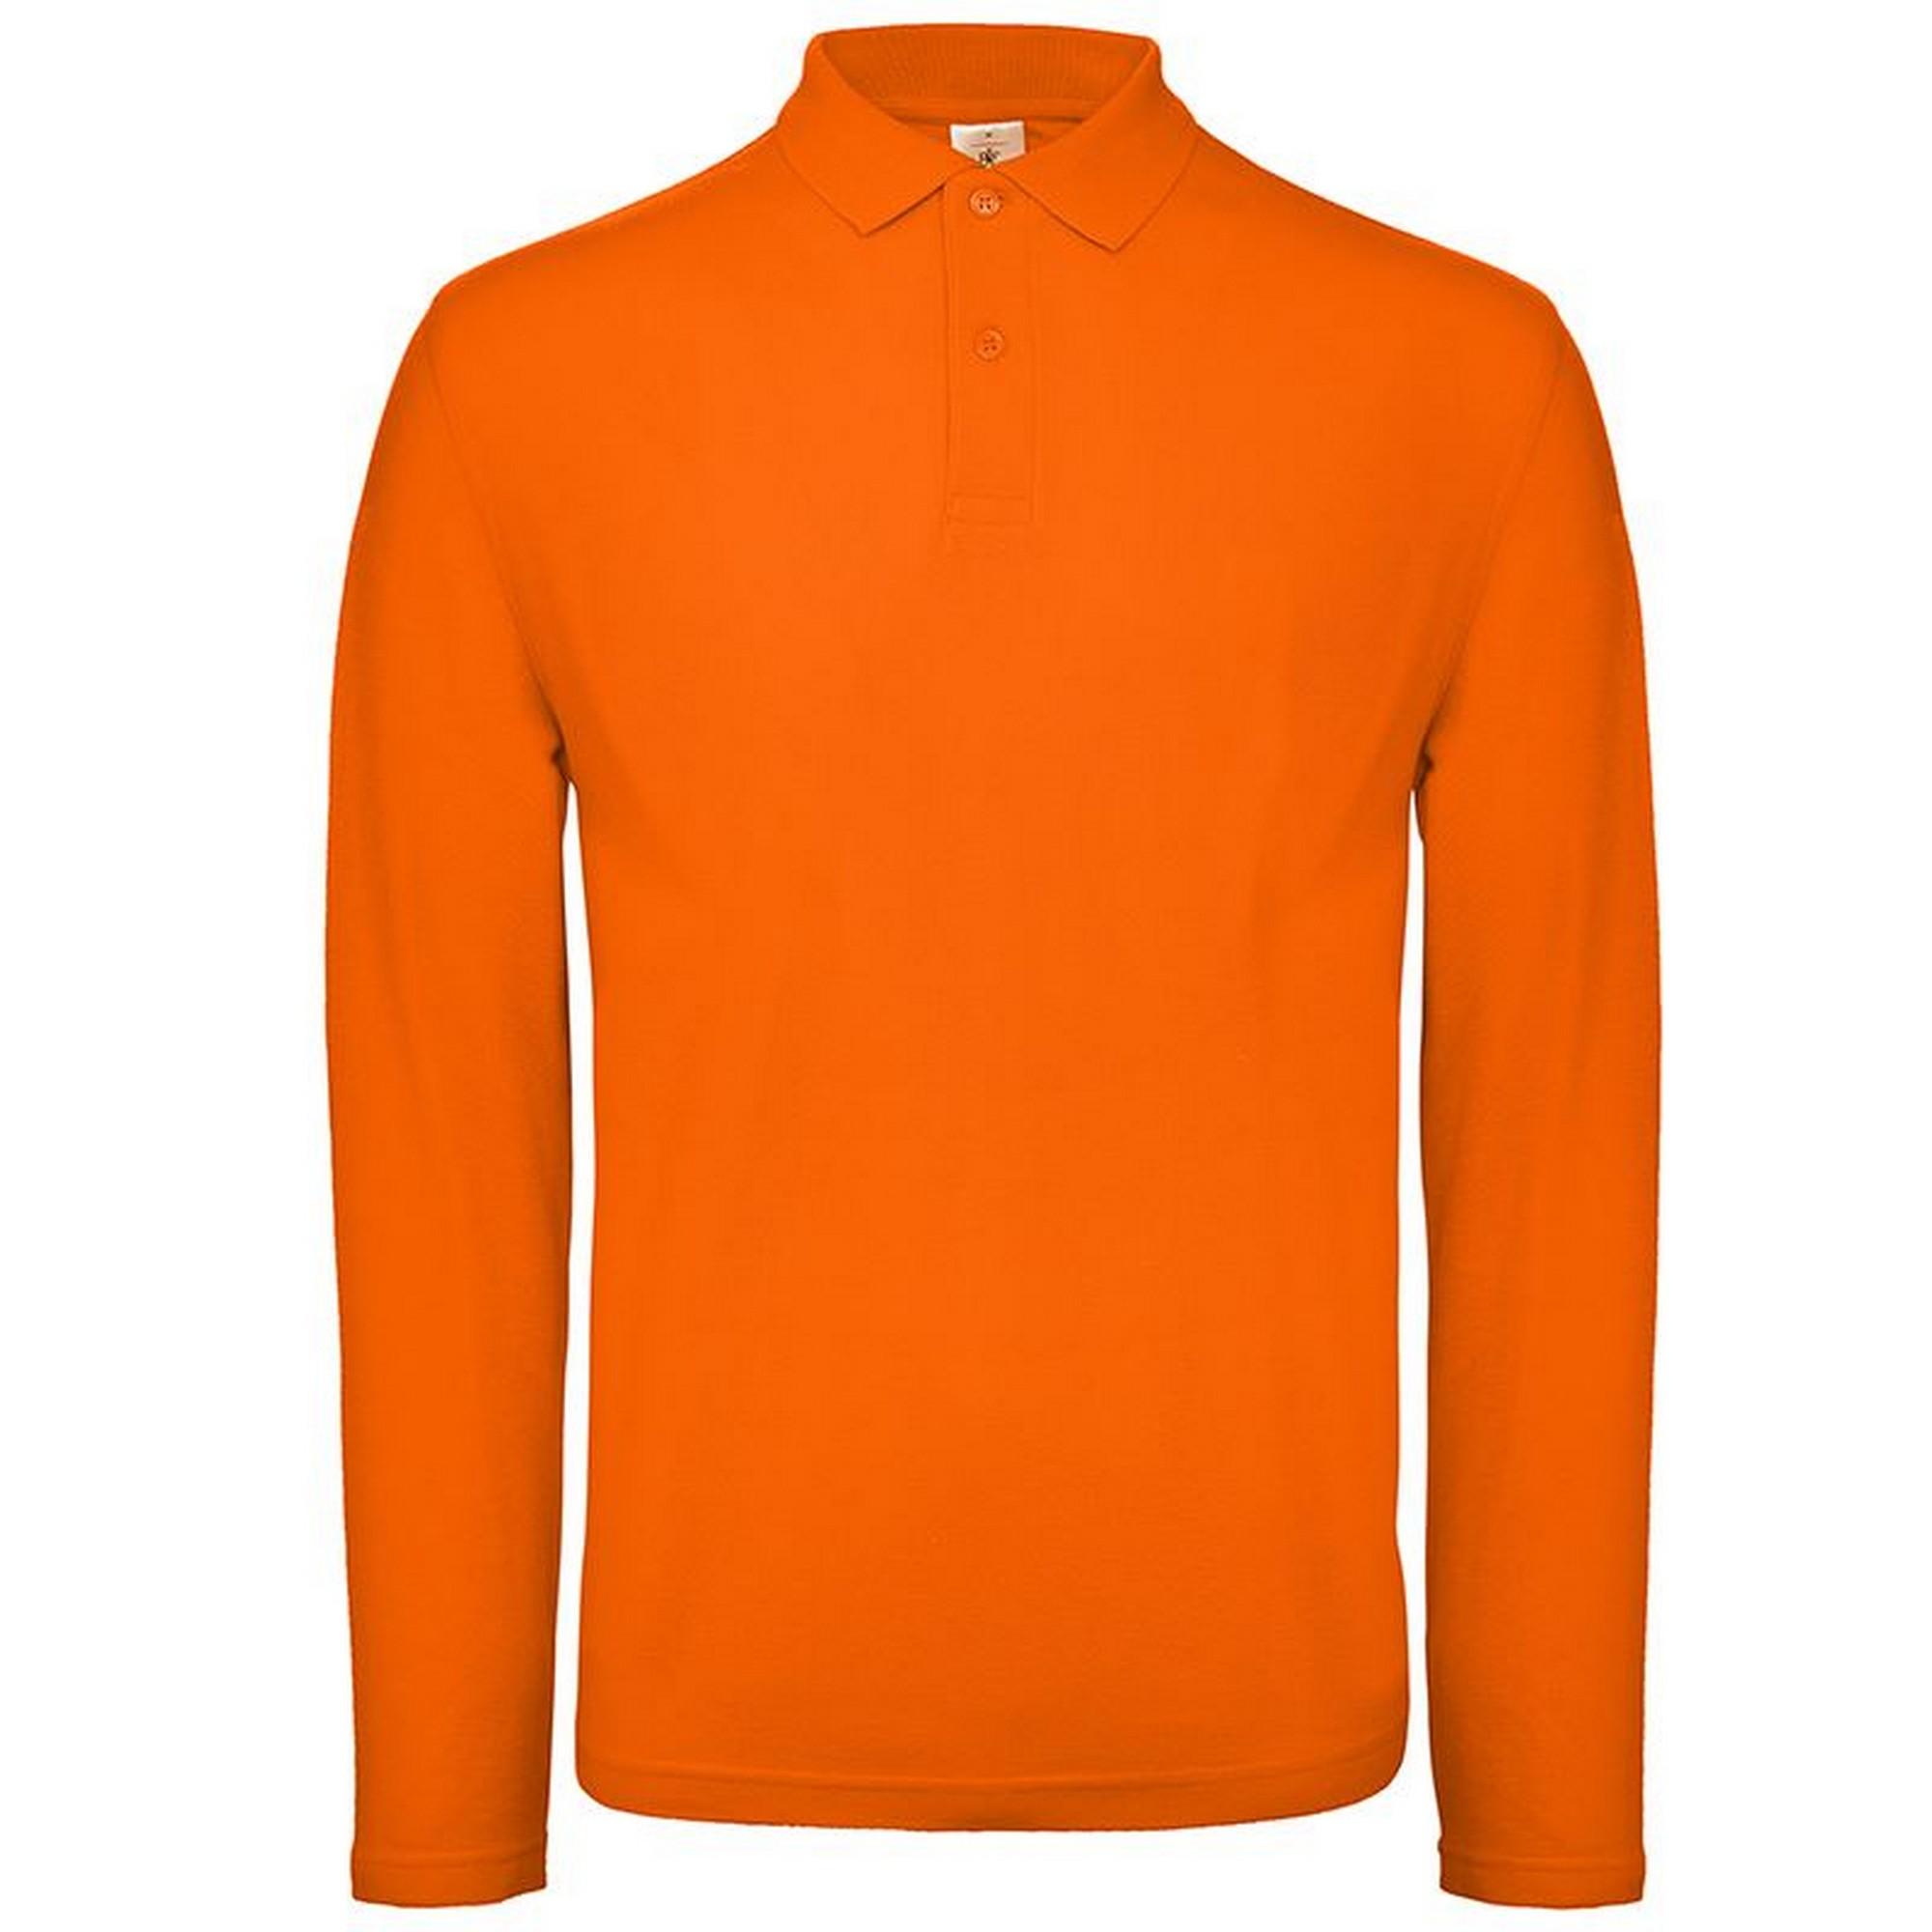 B&C Collection Mens Long Sleeve Polo Shirt (4XL) (Orange)